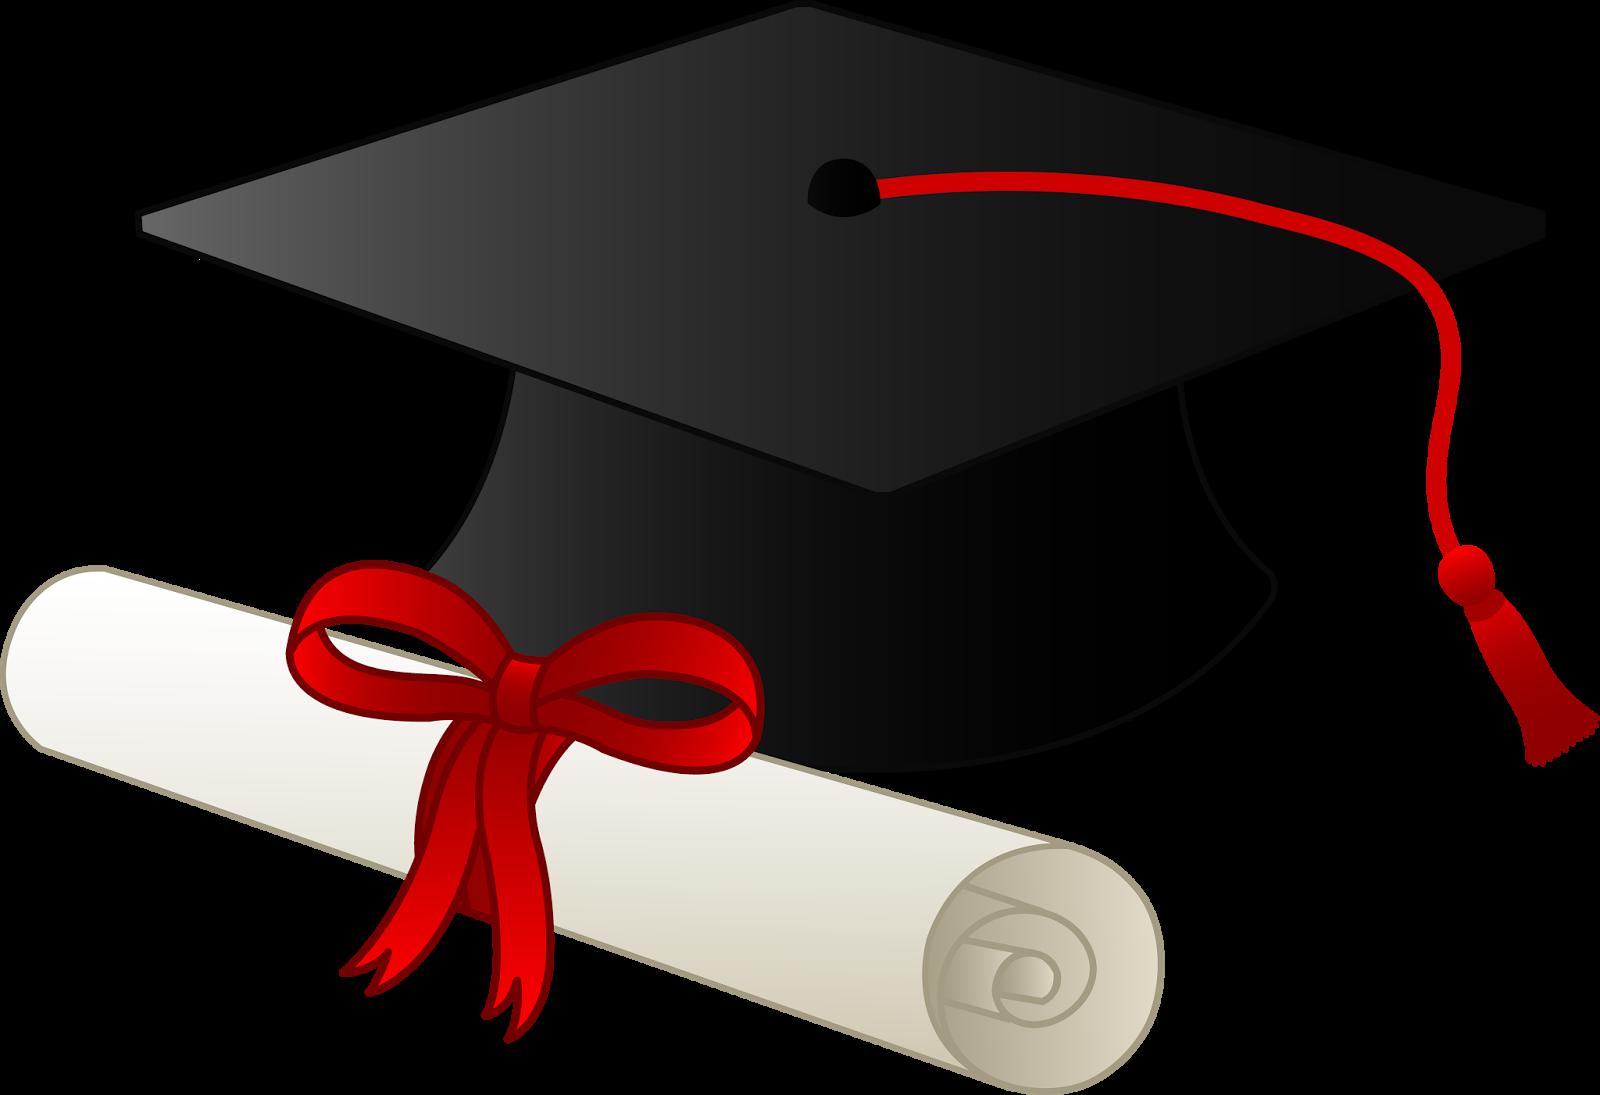 Education clipart graduate school, Education graduate school.